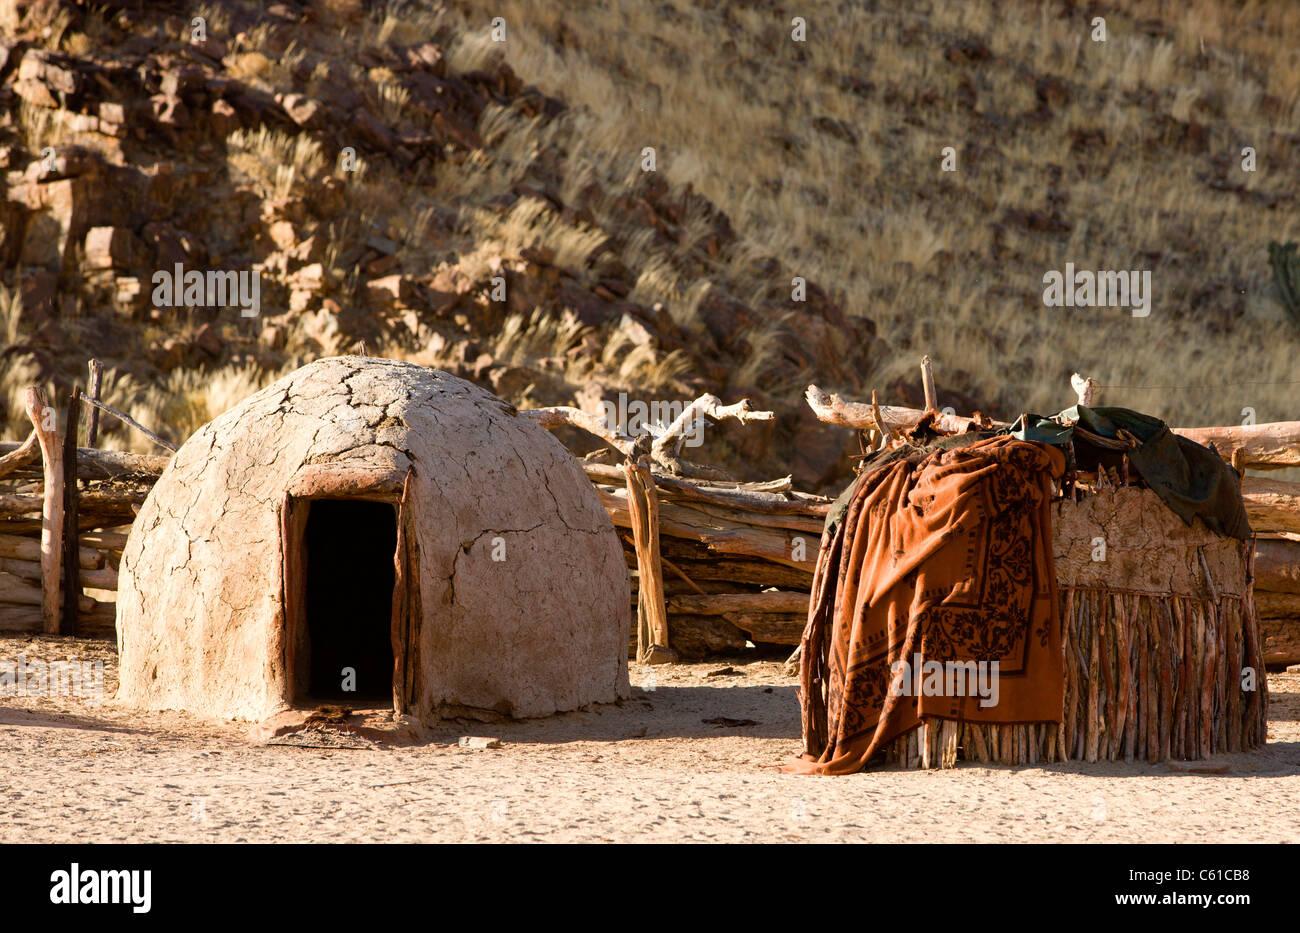 The traditional huts and dwellings of the Himba tribe. Purros, Northern Kaokoland, Kaokoveld, Namibia. - Stock Image